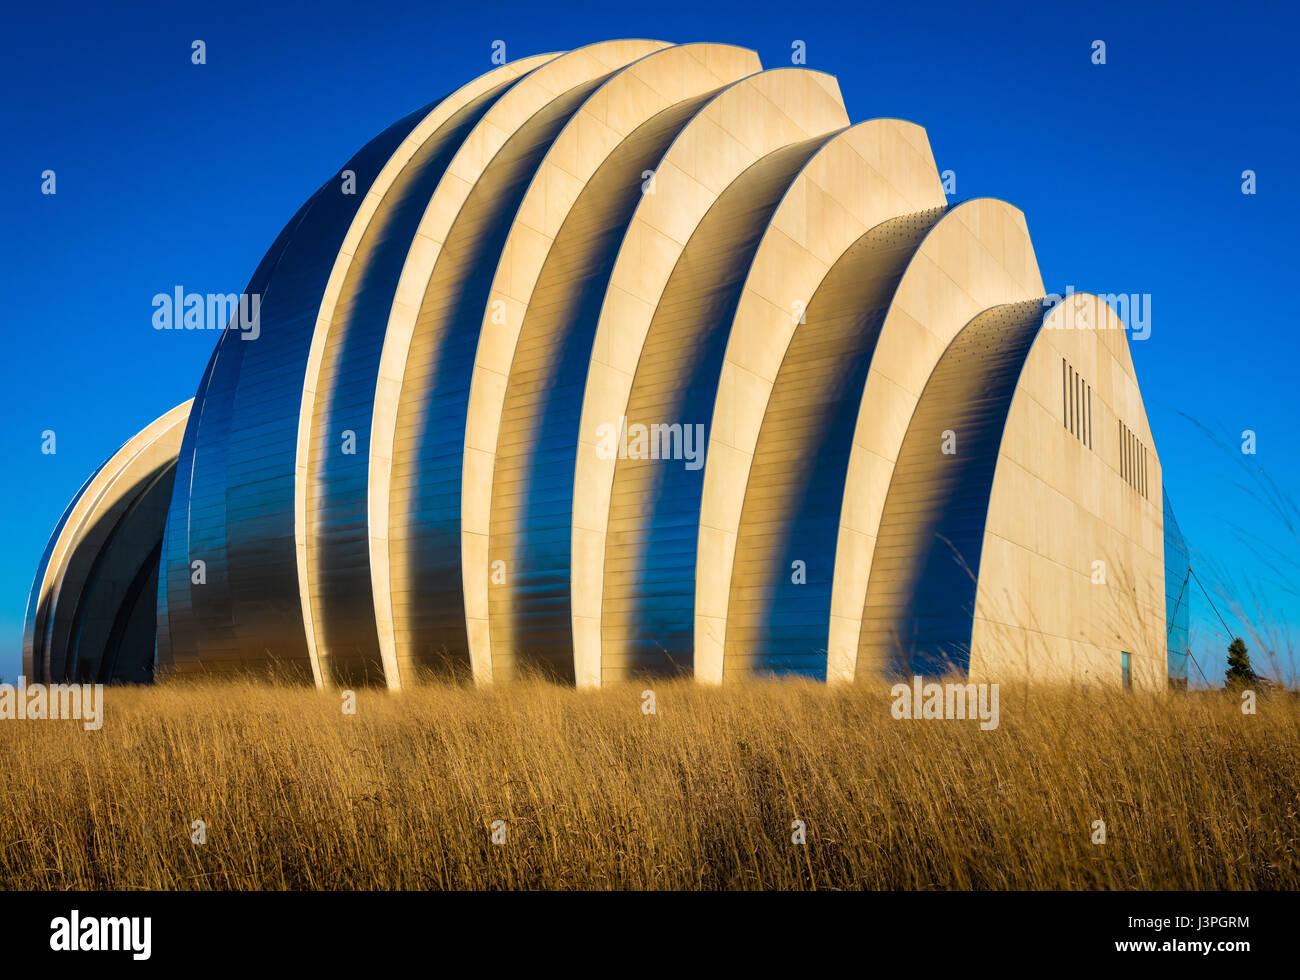 Kauffman Center for the Performing Arts es un centro de artes escénicas en el centro de Kansas City, Missouri, Imagen De Stock